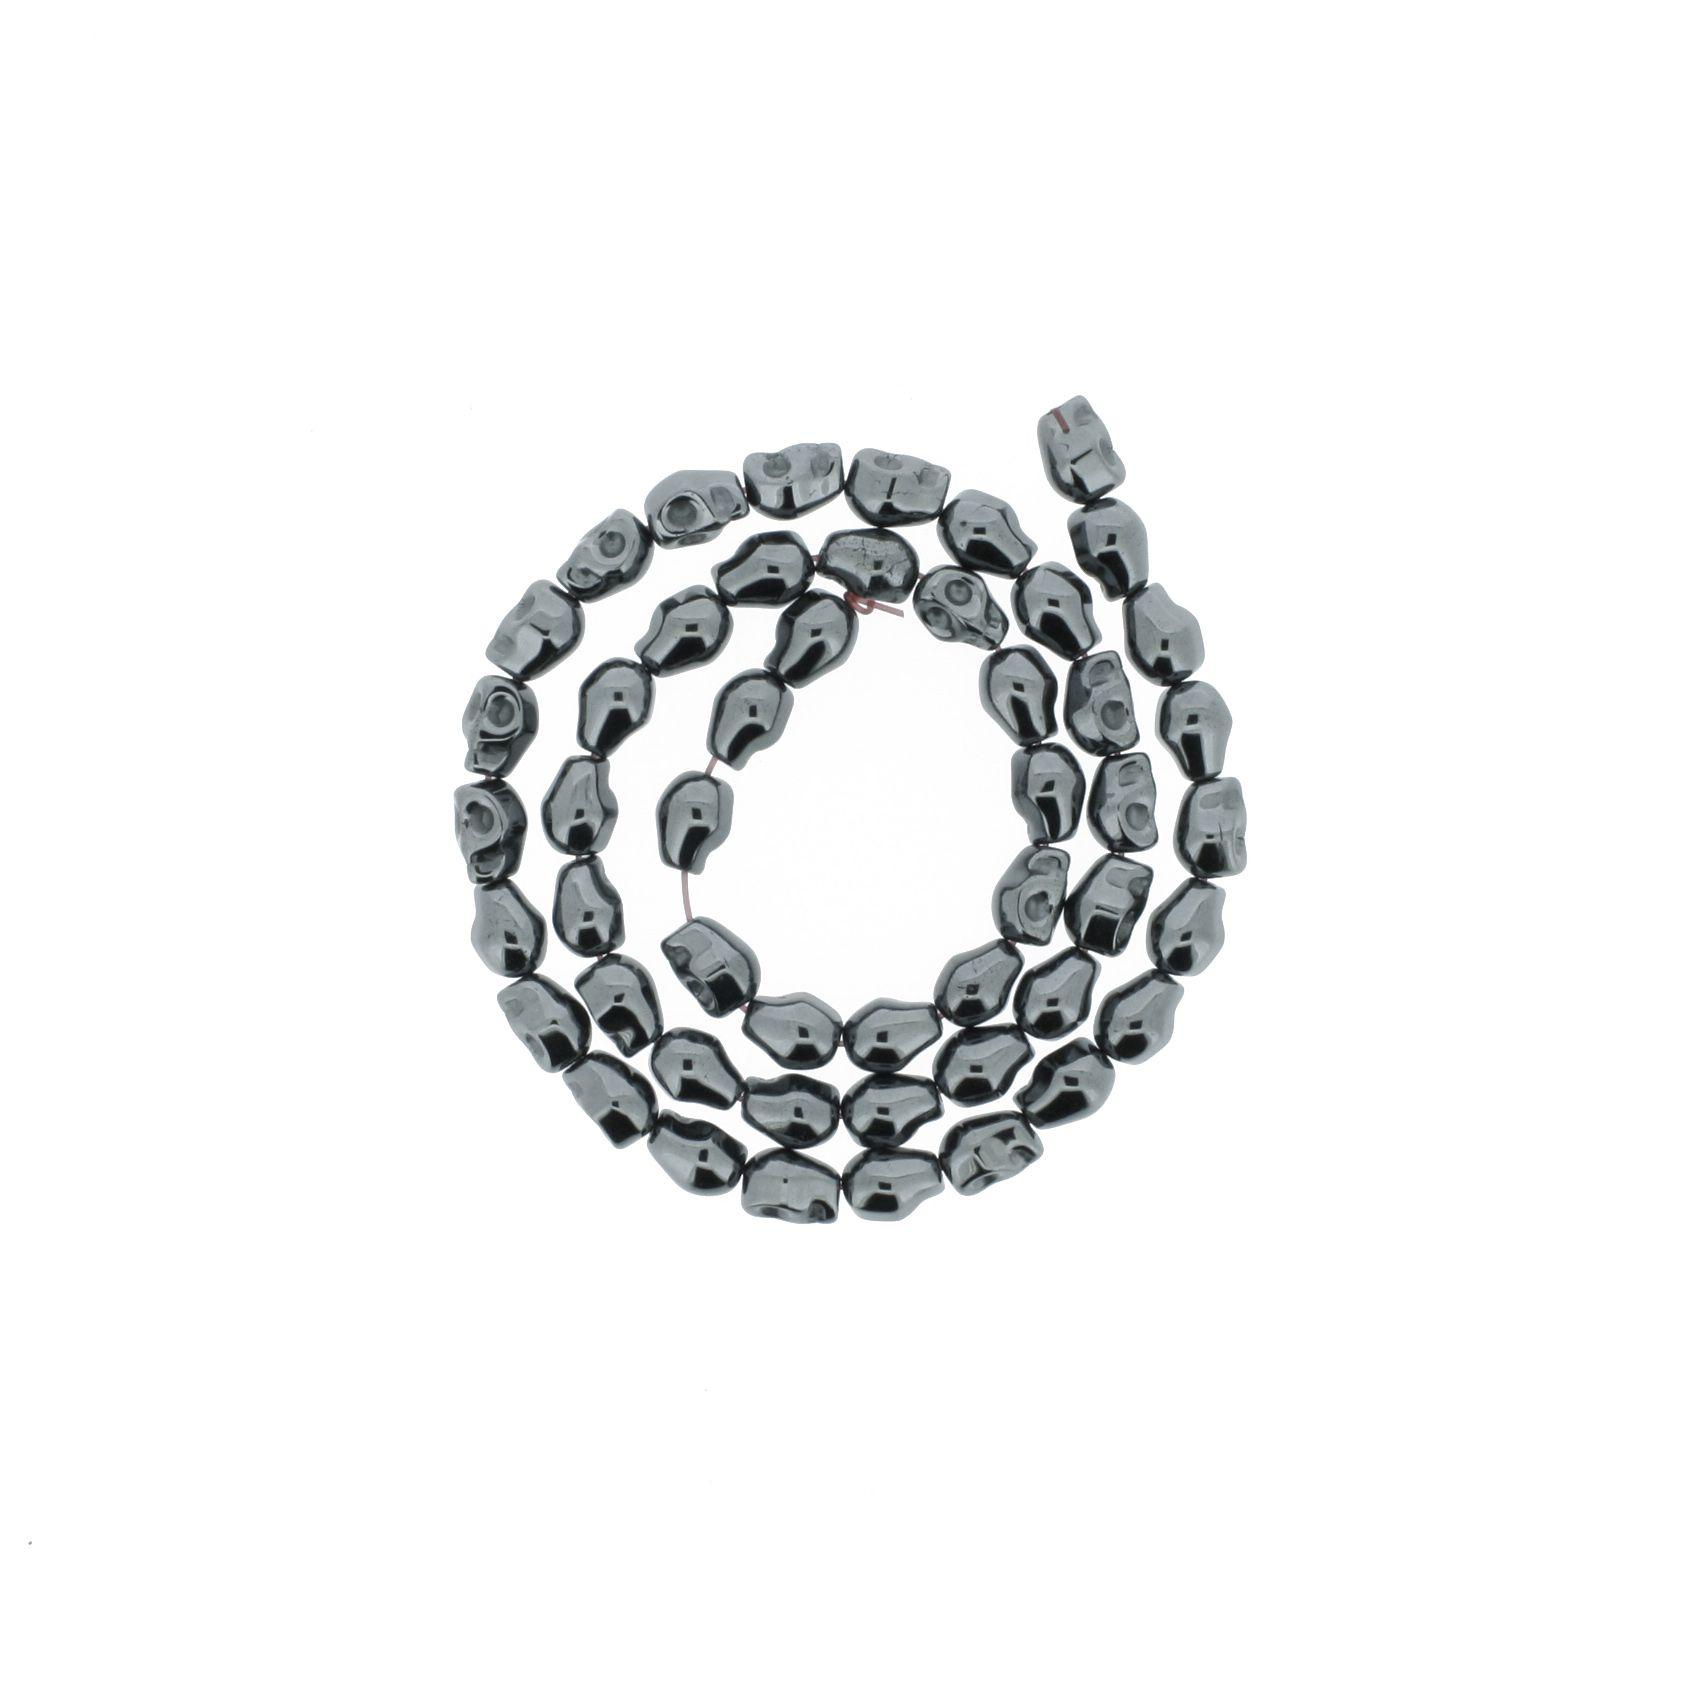 Fio de Pedra - Hematita Caveira - 8mm  - Stéphanie Bijoux® - Peças para Bijuterias e Artesanato